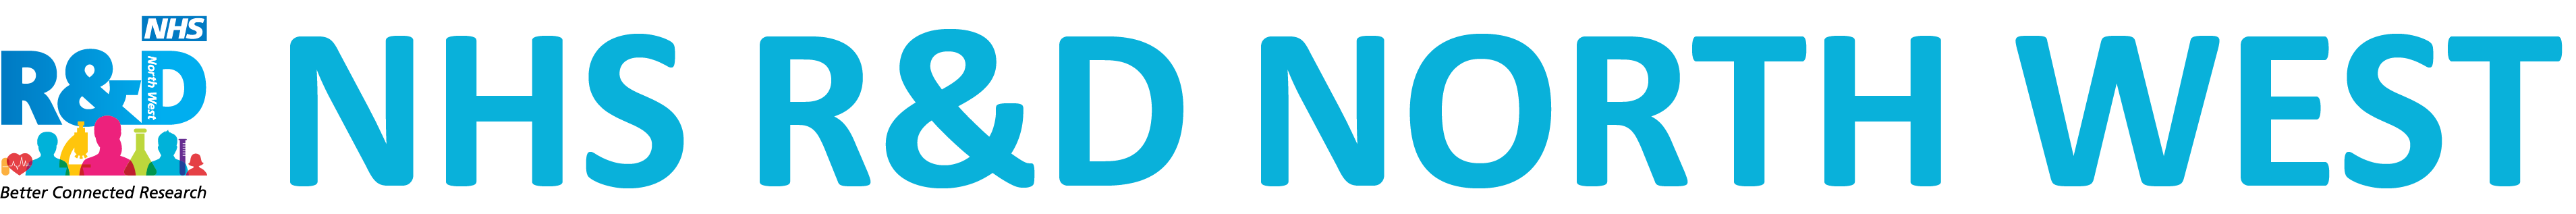 NHS R&D North West